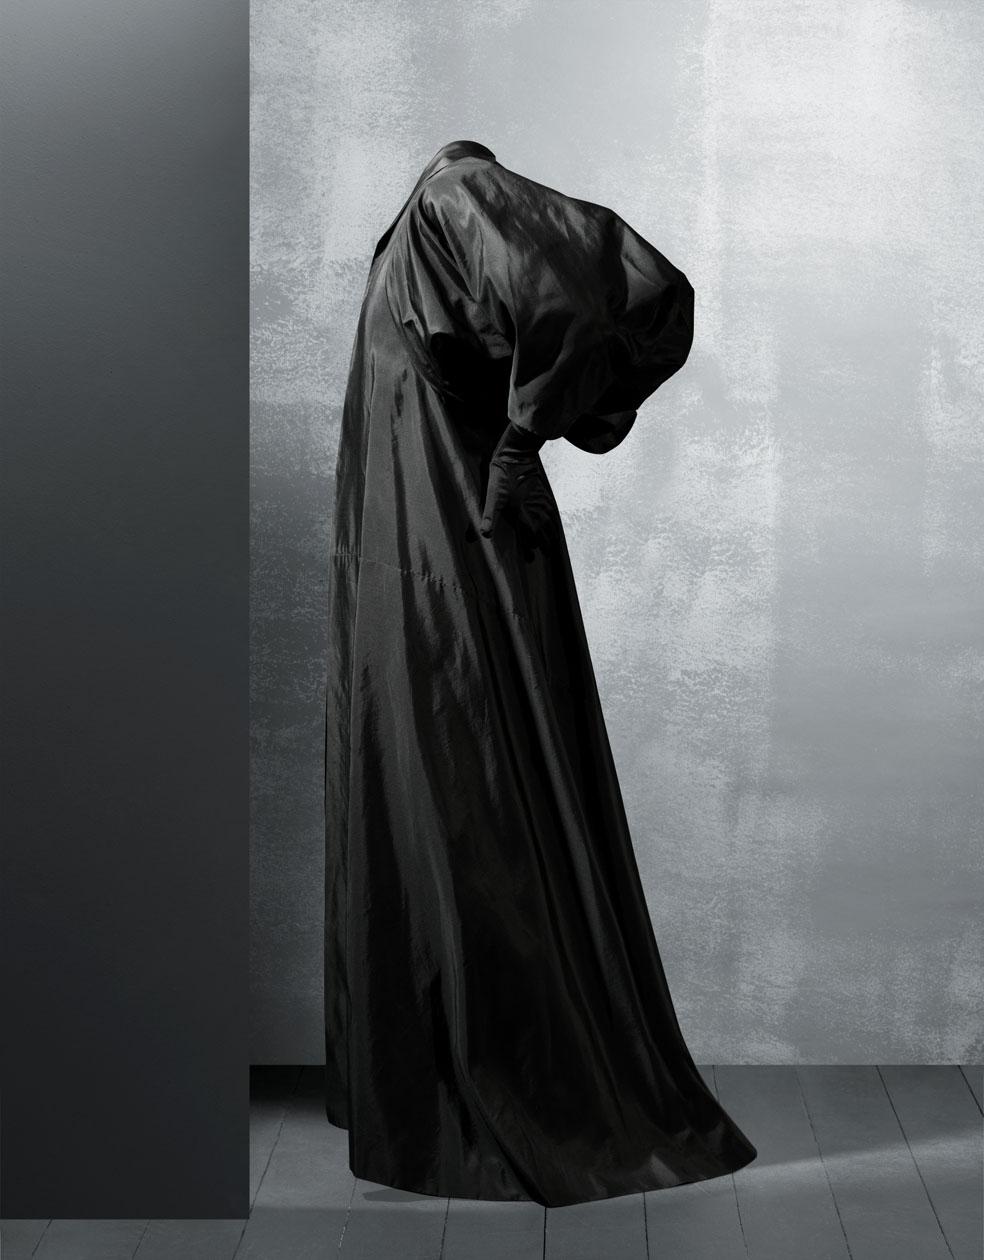 Abrigo de noche en tafetán de seda de color negro